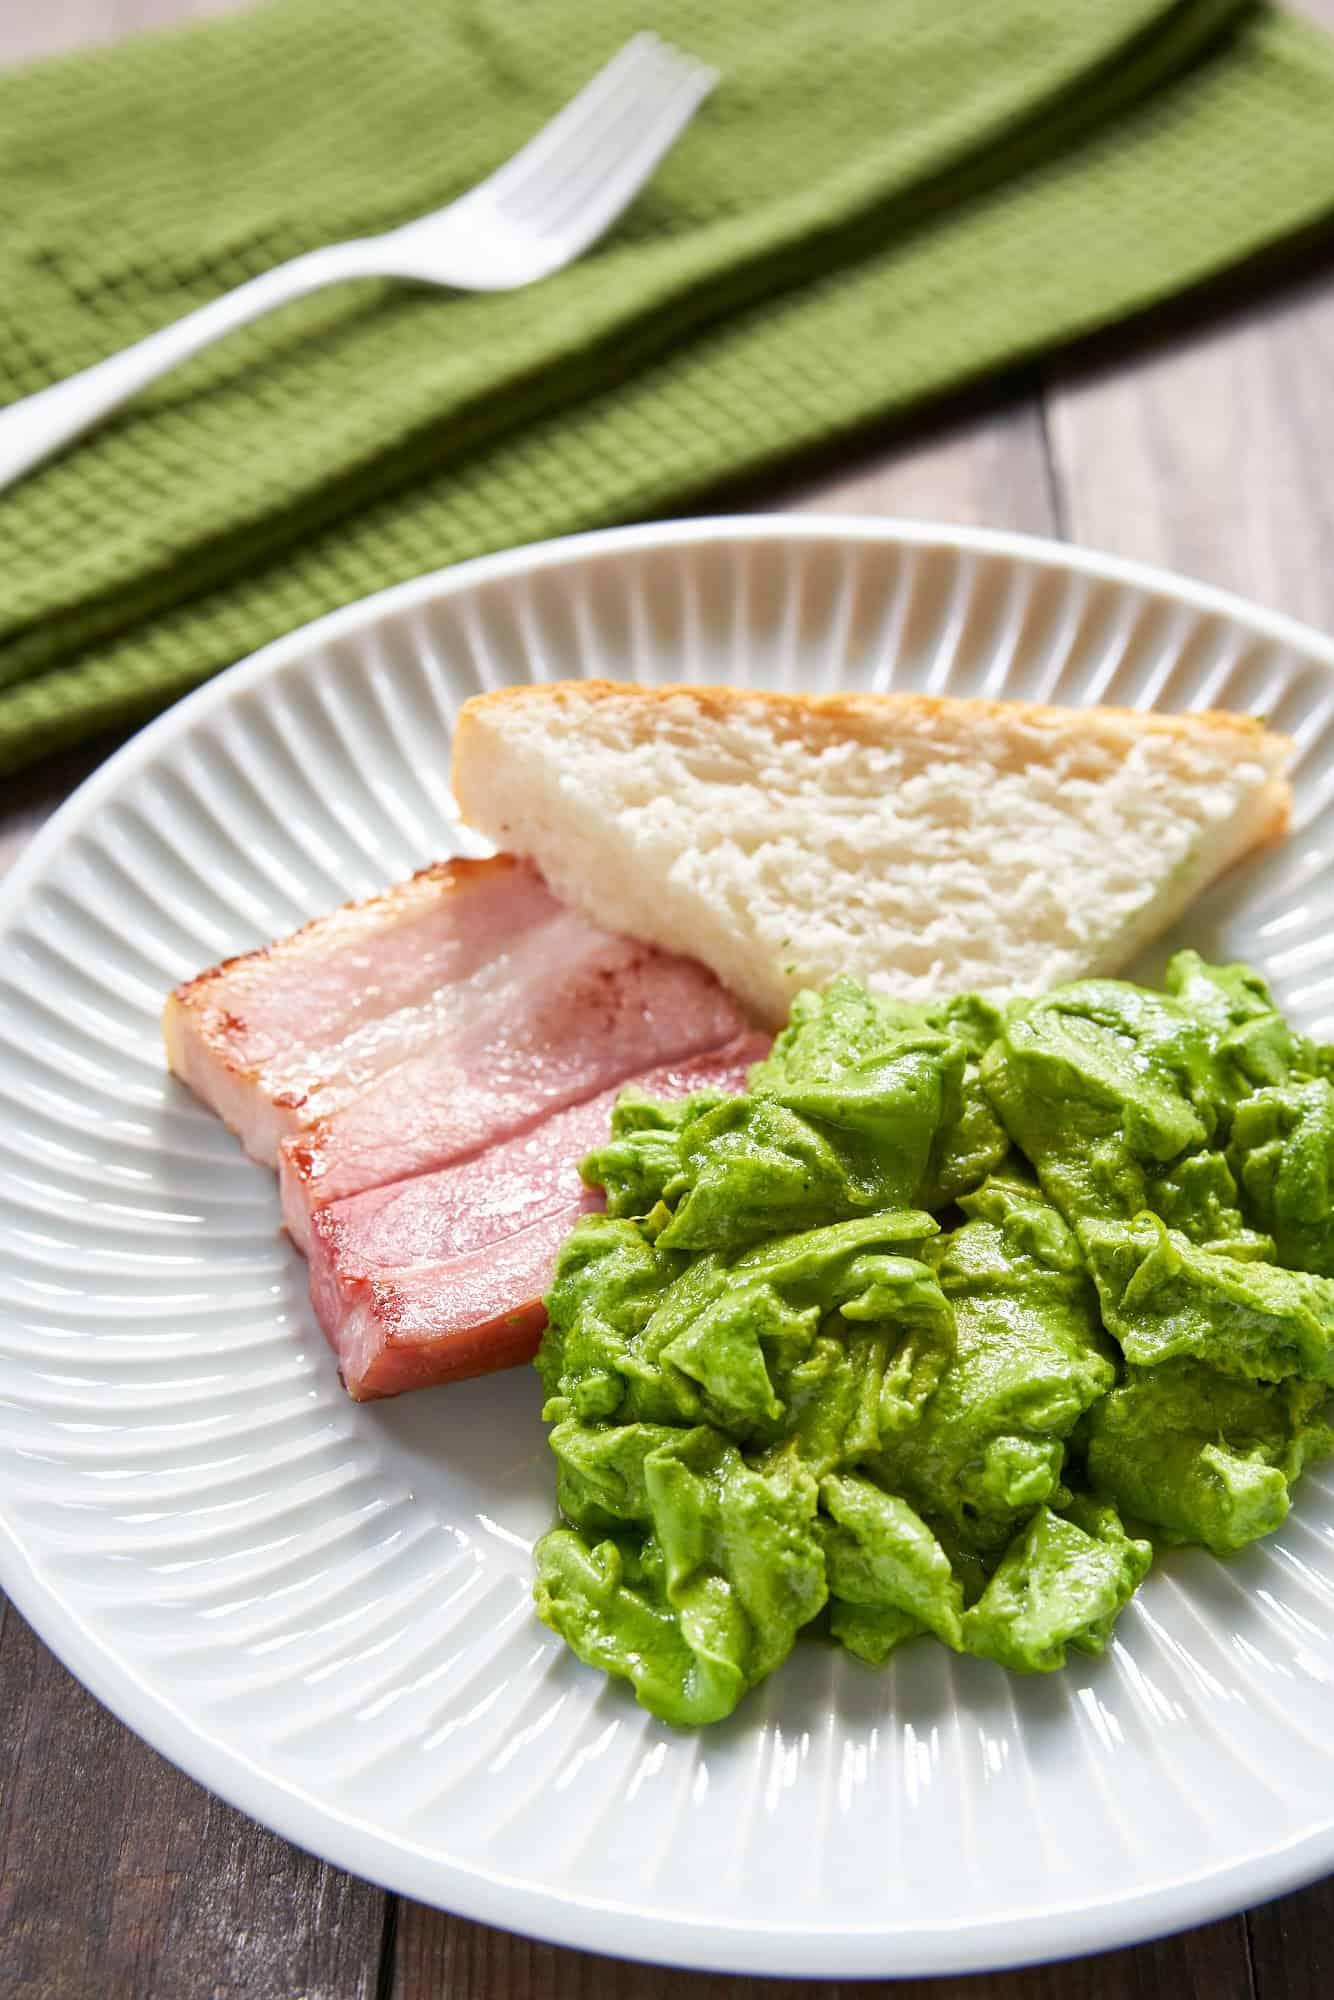 Green eggs and ham recipe using matcha powder to turn the scrambled eggs green.